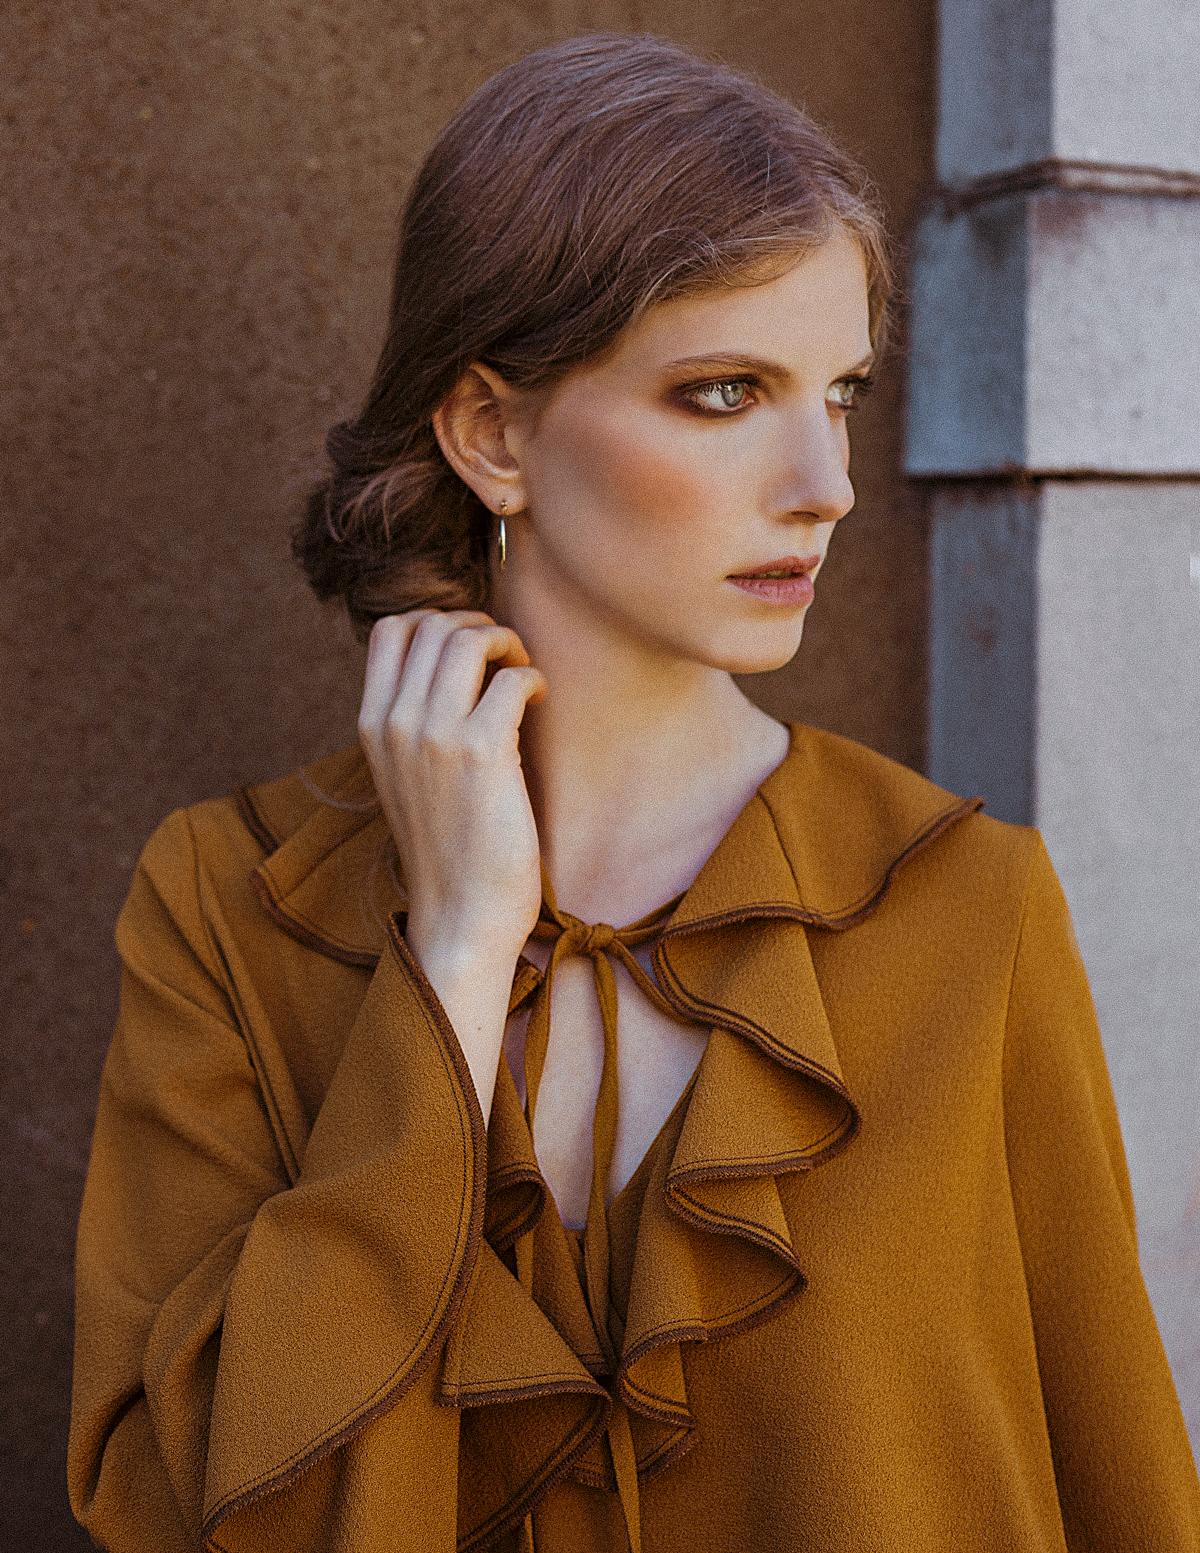 Kat Terek Fashion Editorial for Editorial QC Model Kaya from Lindenstaub Make-up Nora Orthofer Styling Mihaela Popa